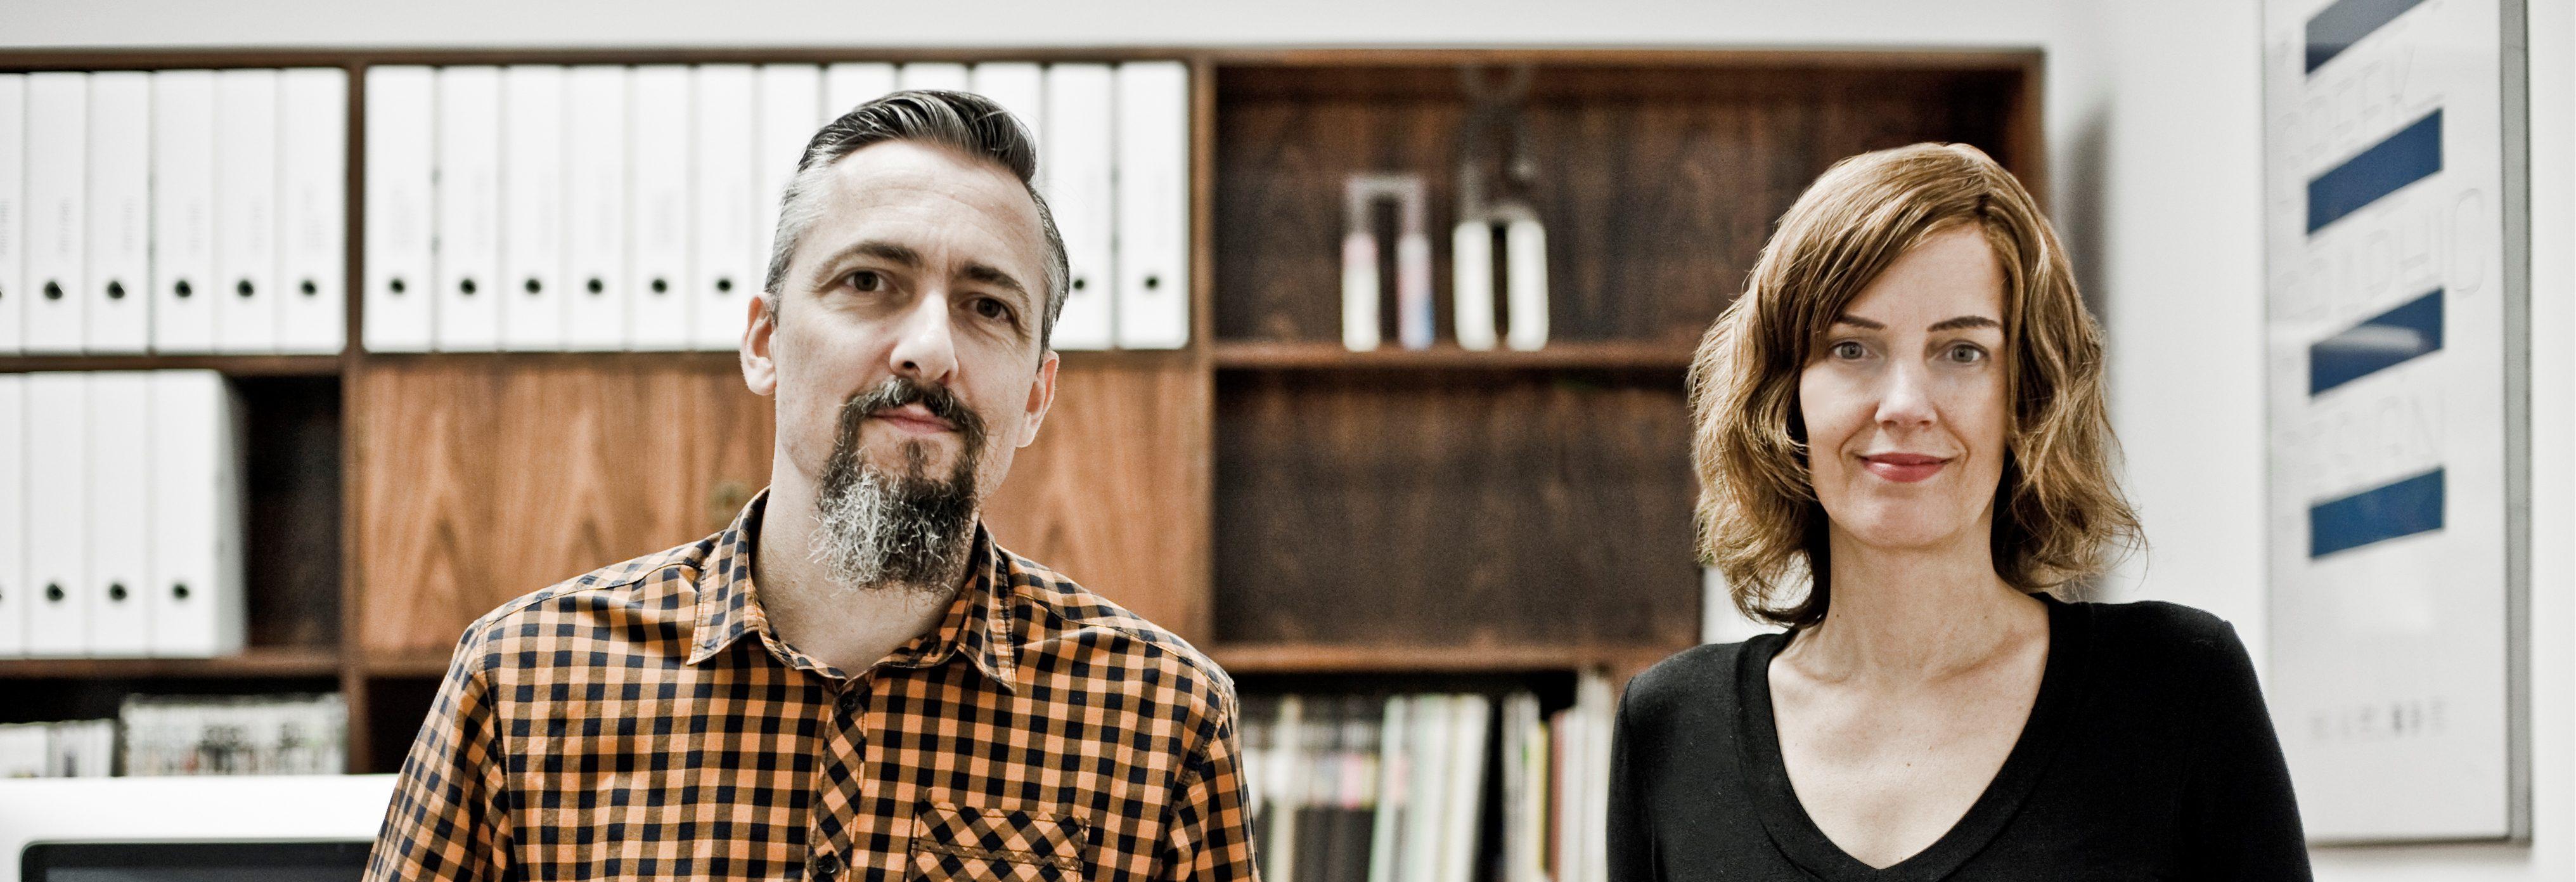 Pi6 Designers | MANTILITY | Silk Scarves Gallery